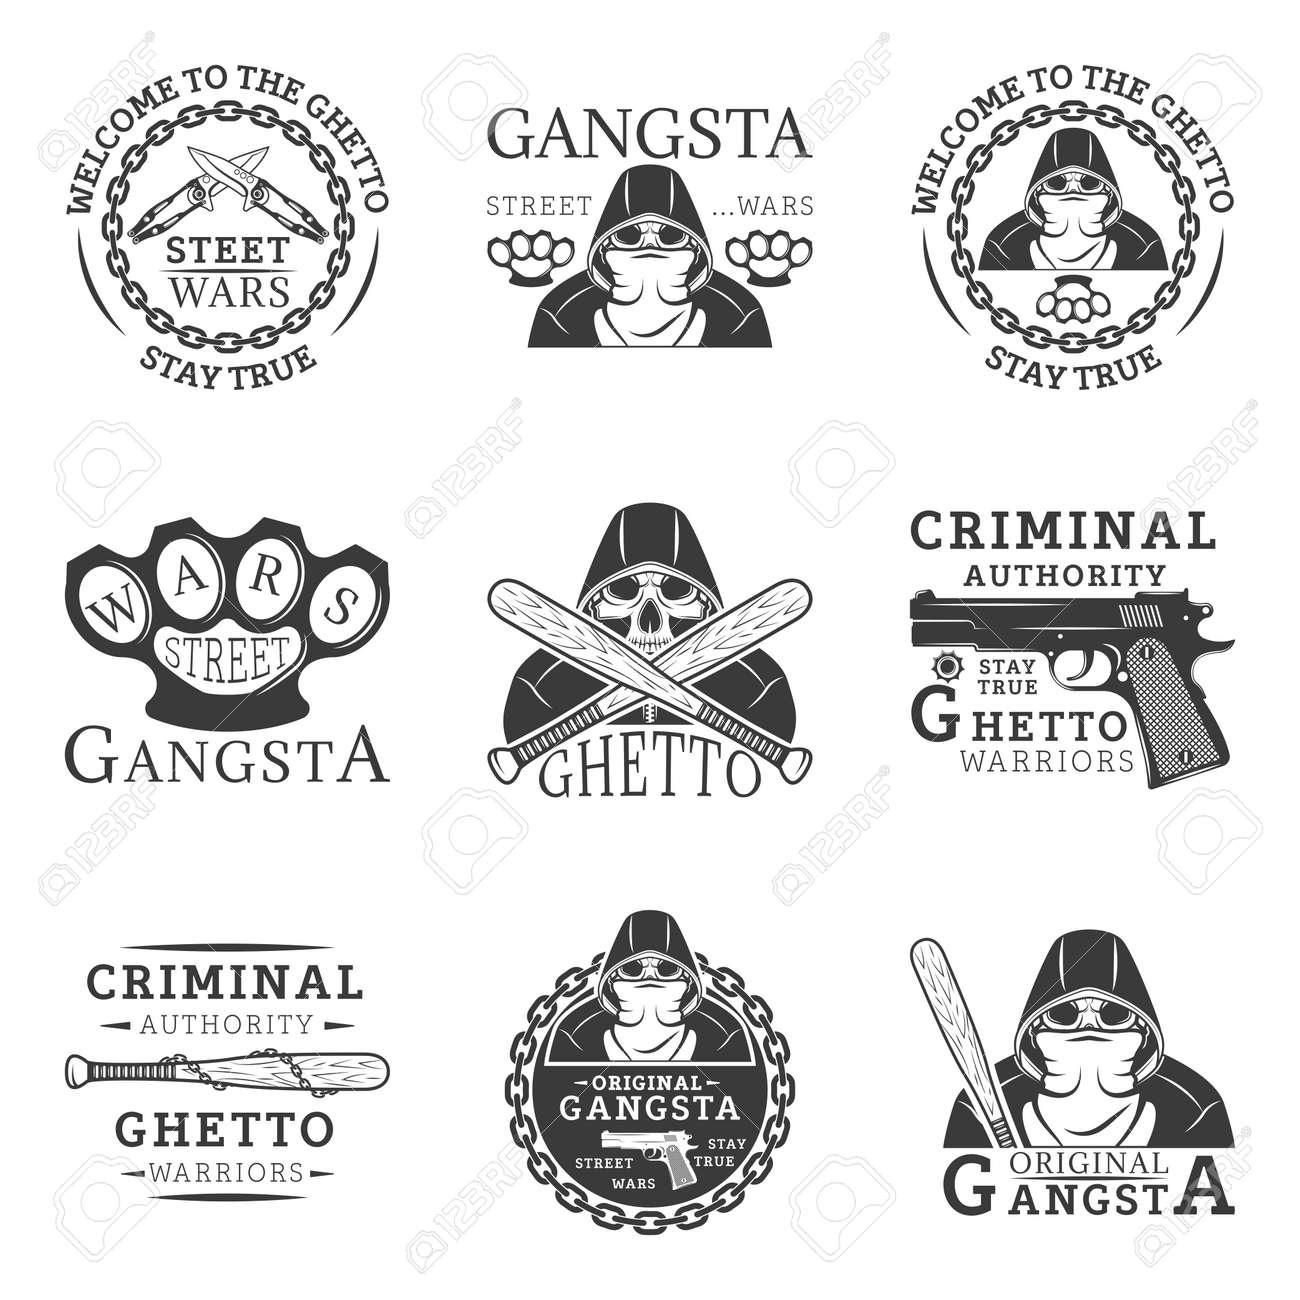 Gangster ghetto street wars set of vector vintage logos royalty gangster ghetto street wars set of vector vintage logos stock vector 73379701 sciox Gallery